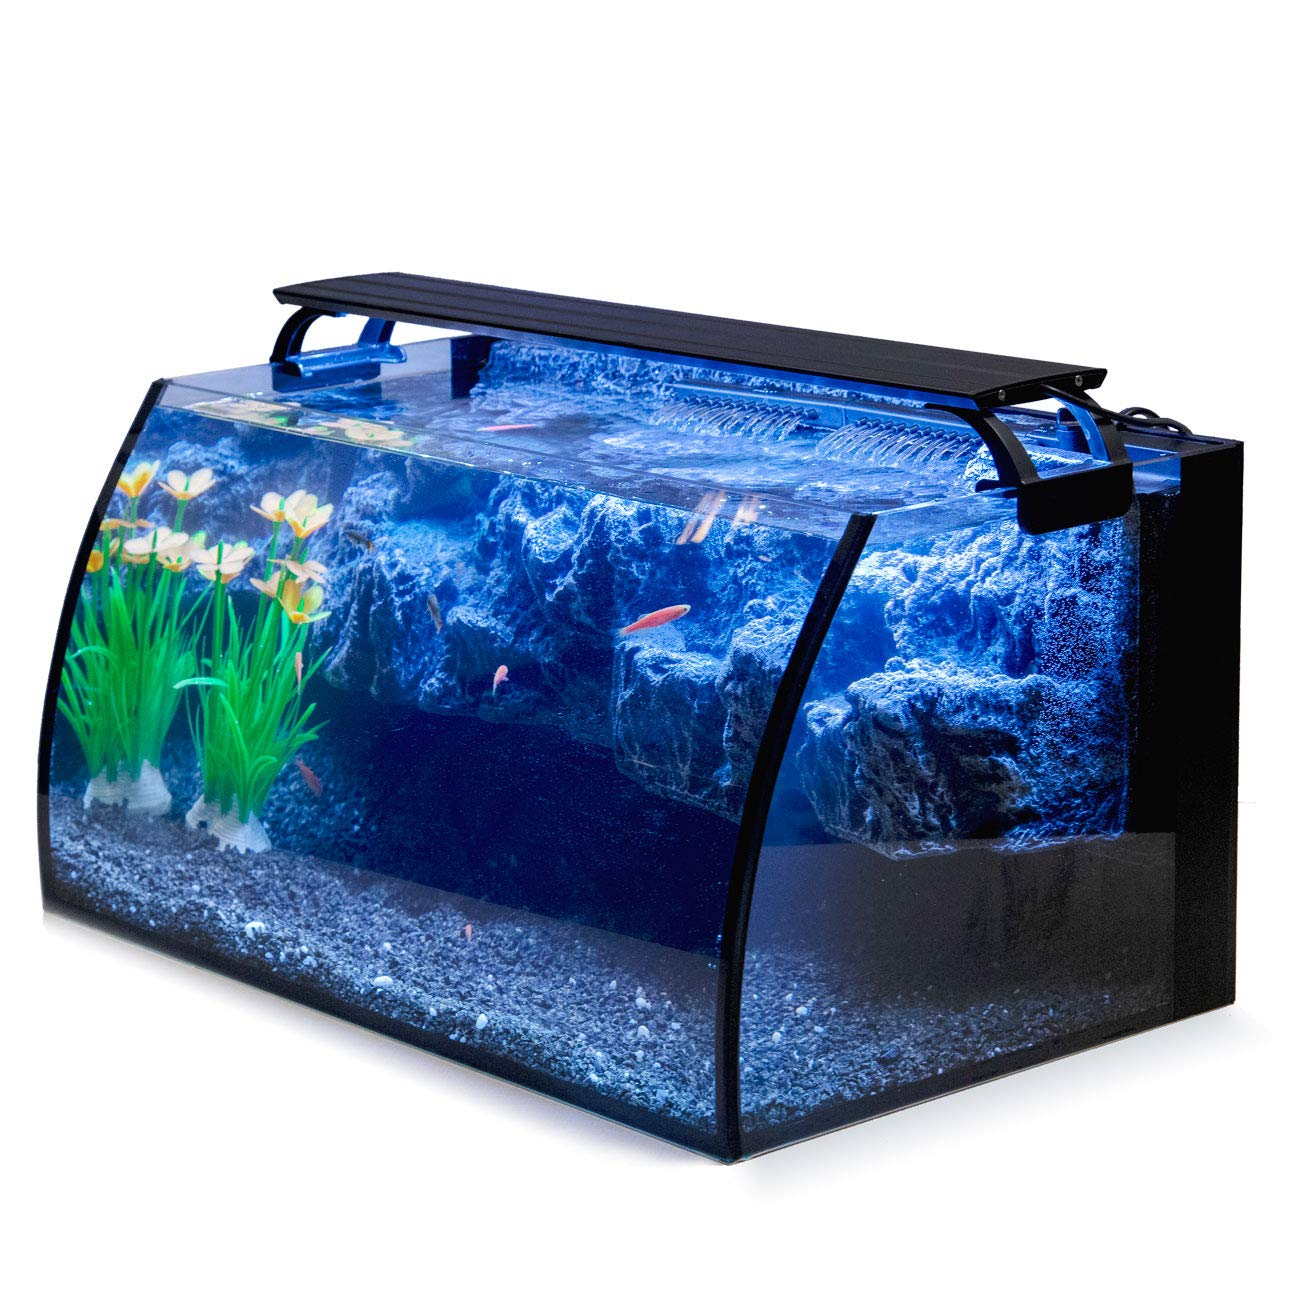 Hygger Horizon Glass Aquarium for Betta Fish.